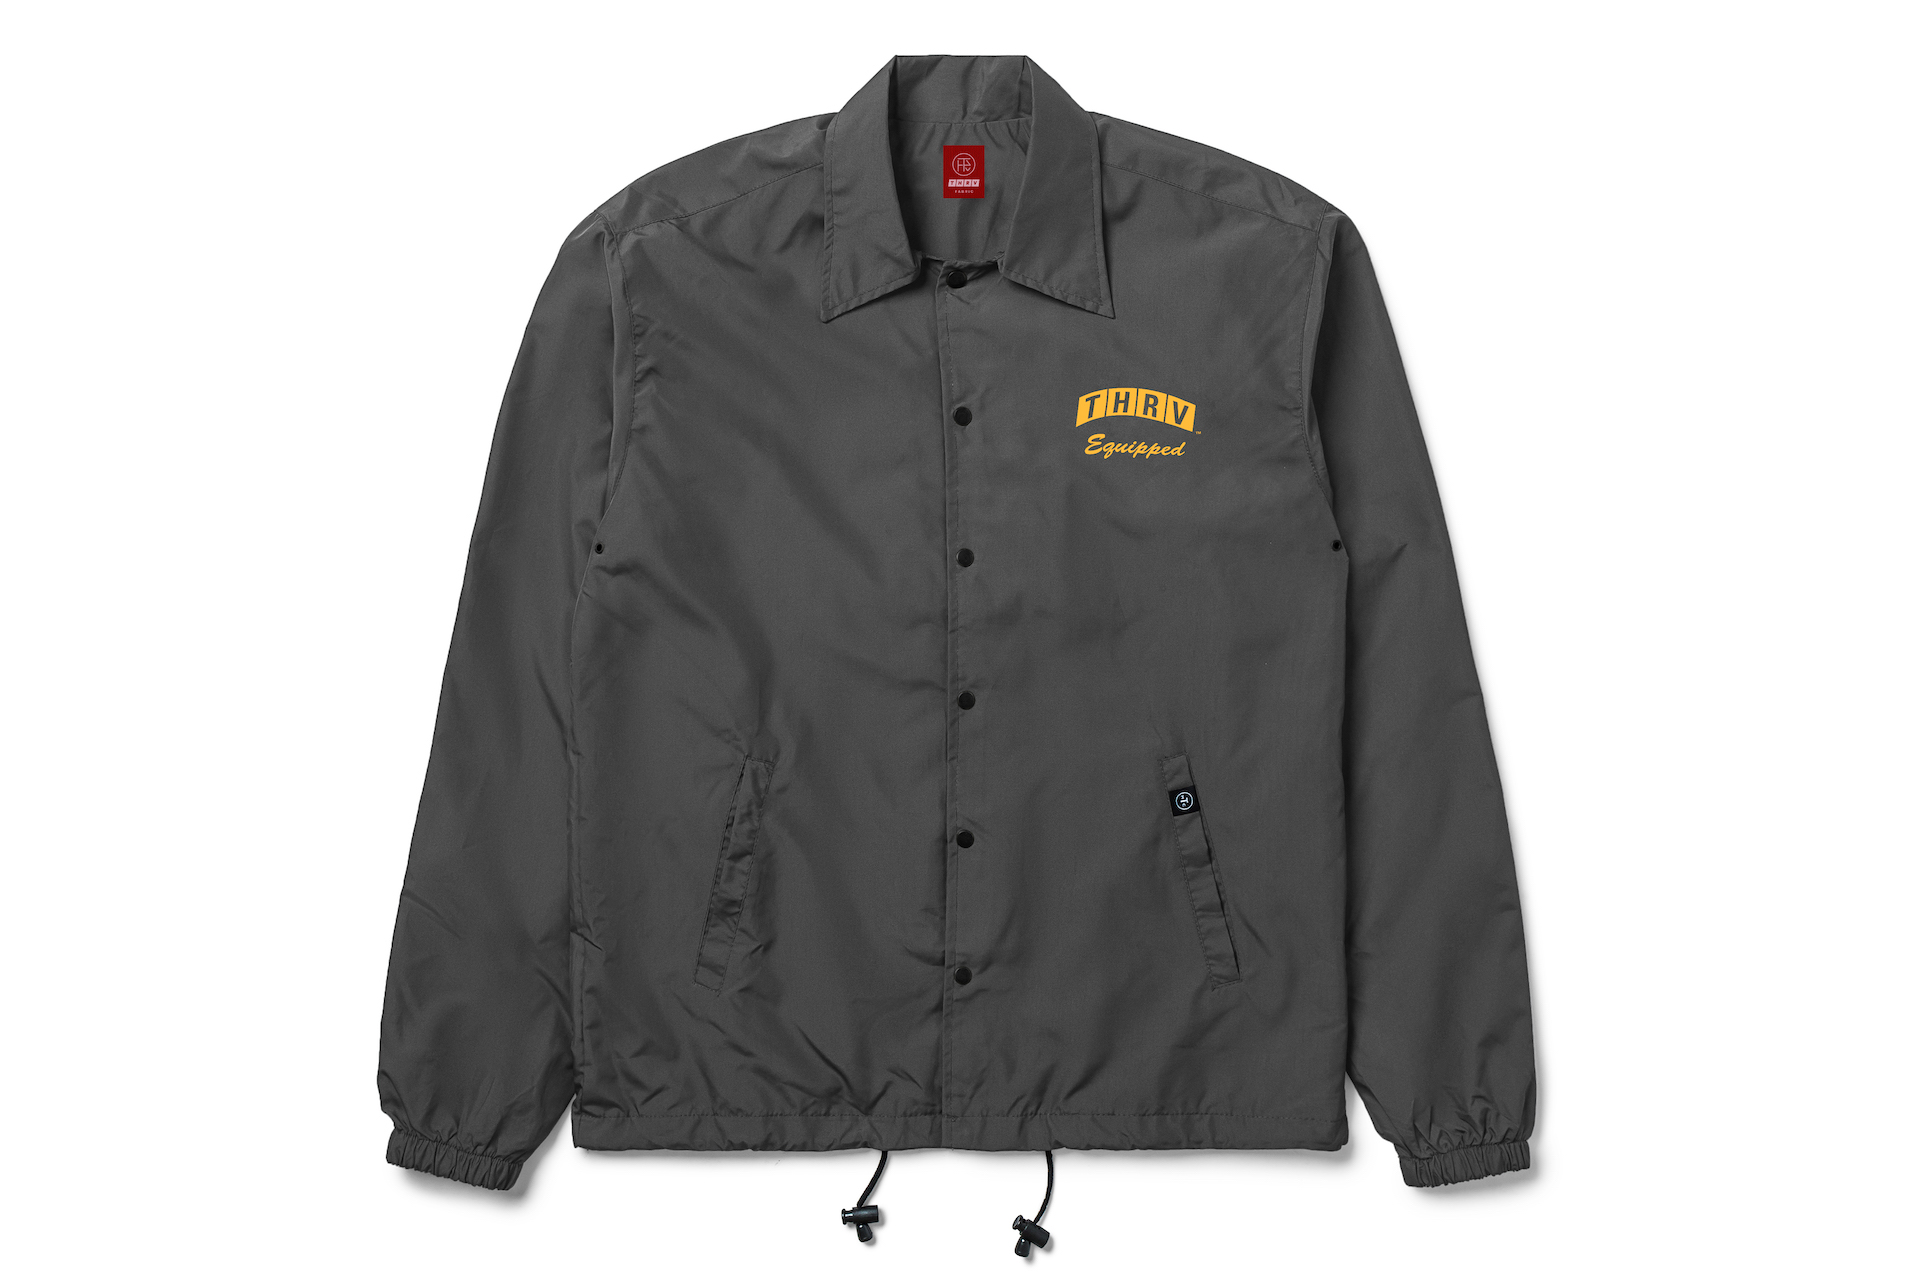 Globetrotter Grey Coach Jacket